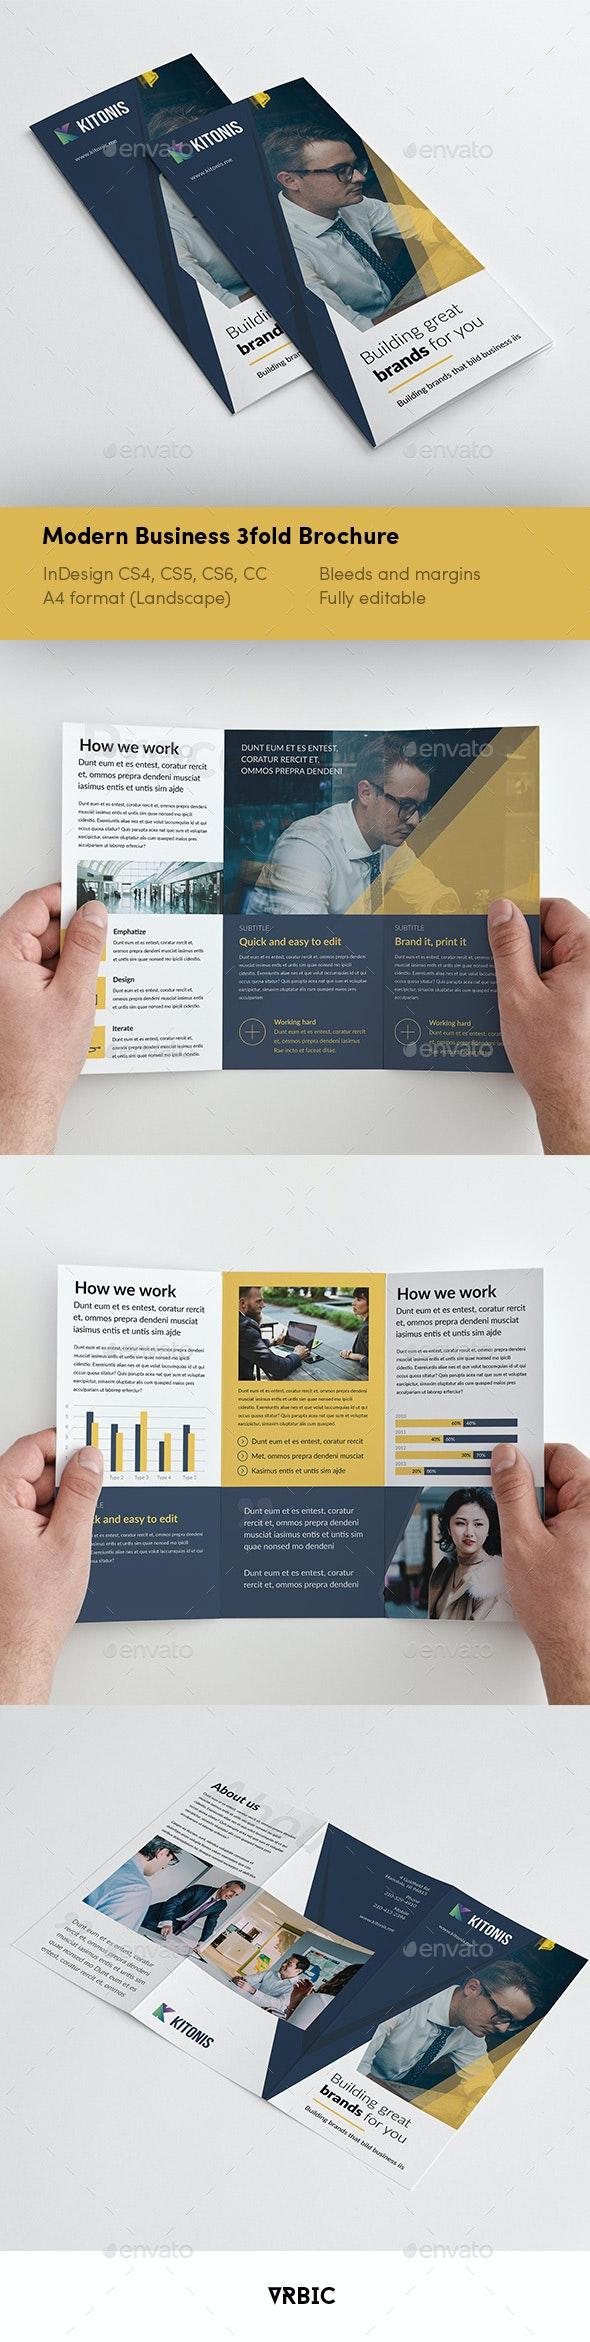 Modern Business 3 fold Brochure - Brochures Print Templates